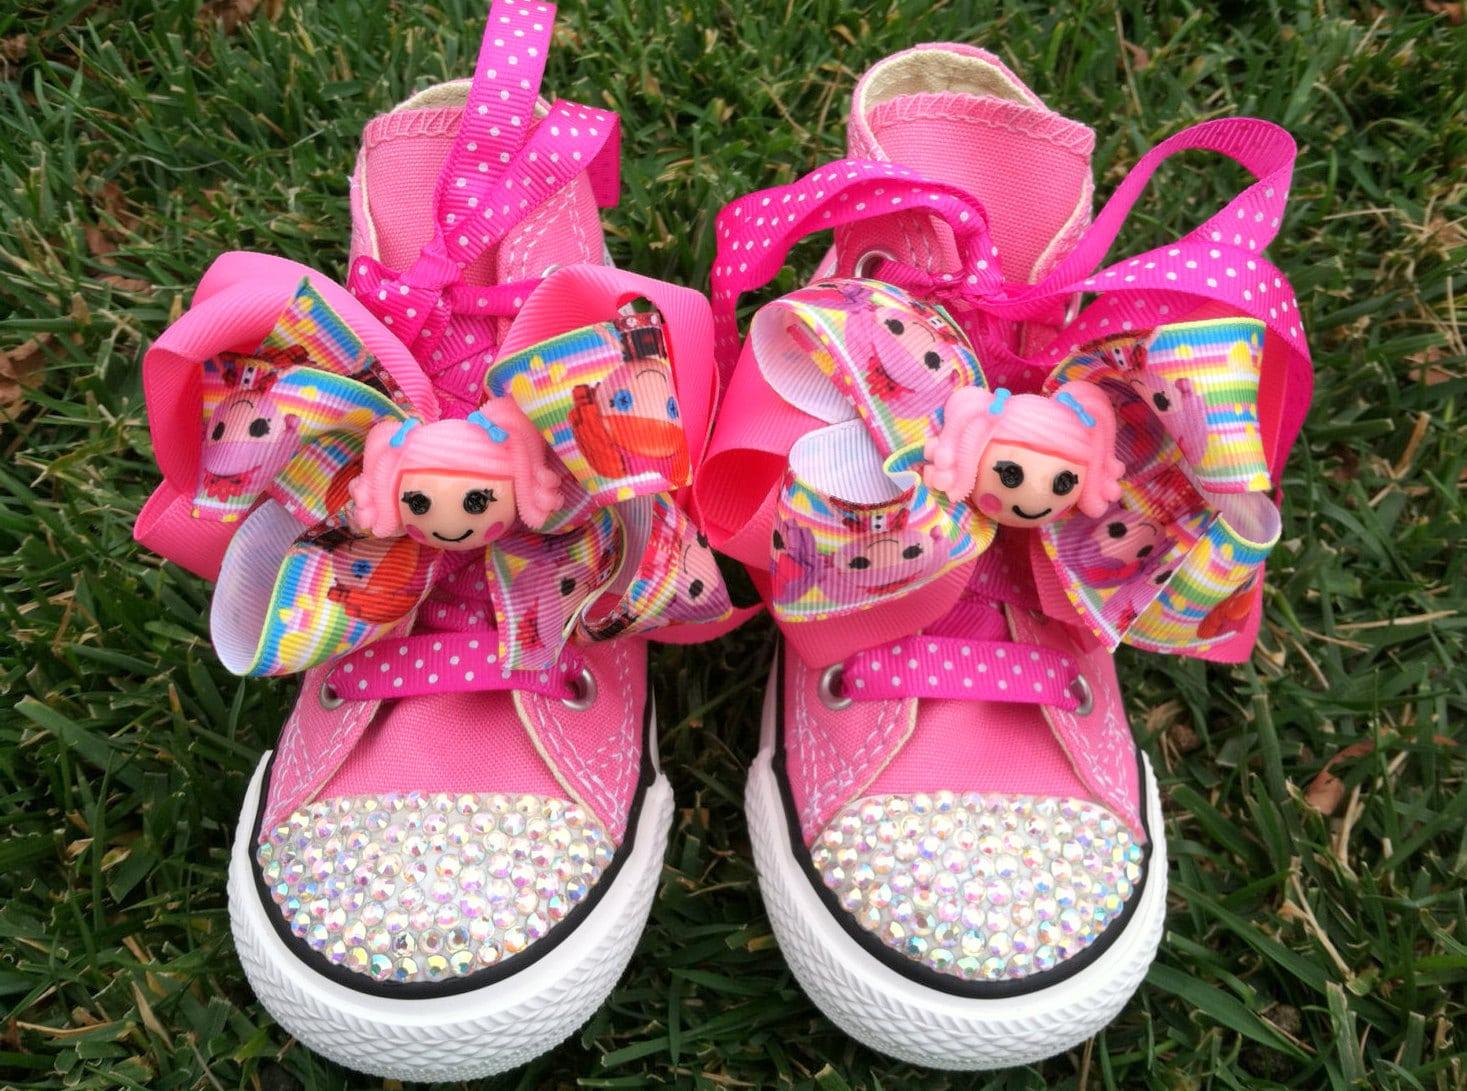 Latest Minnie Mouse Shoes Design